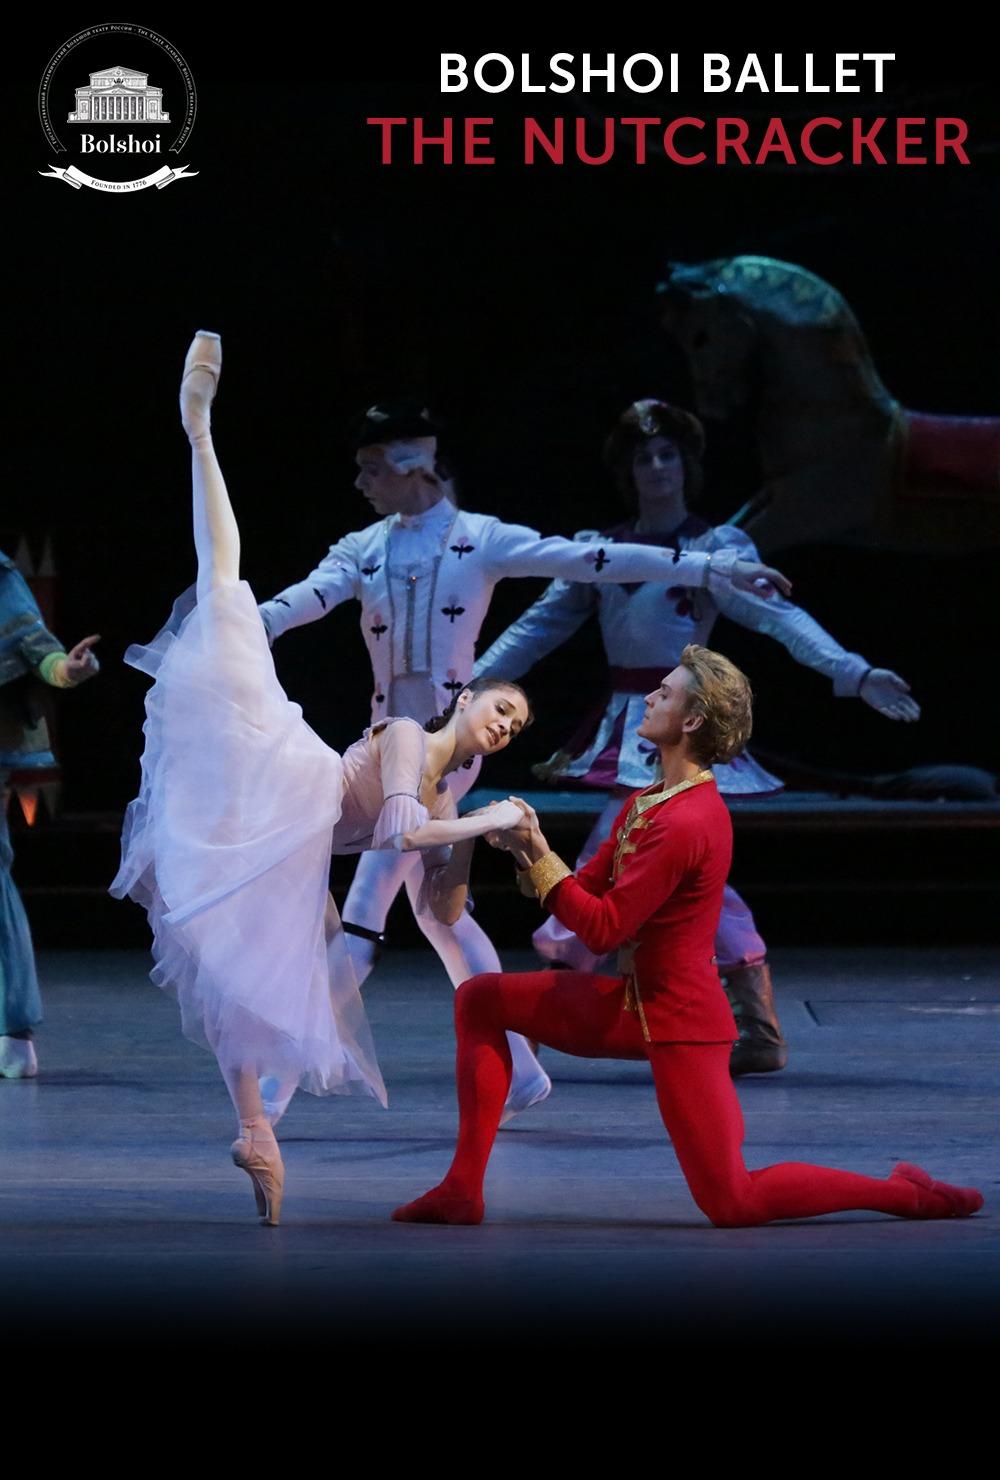 Bolshoi Ballet: The Nutcracker in Movie Theaters | Fathom Events